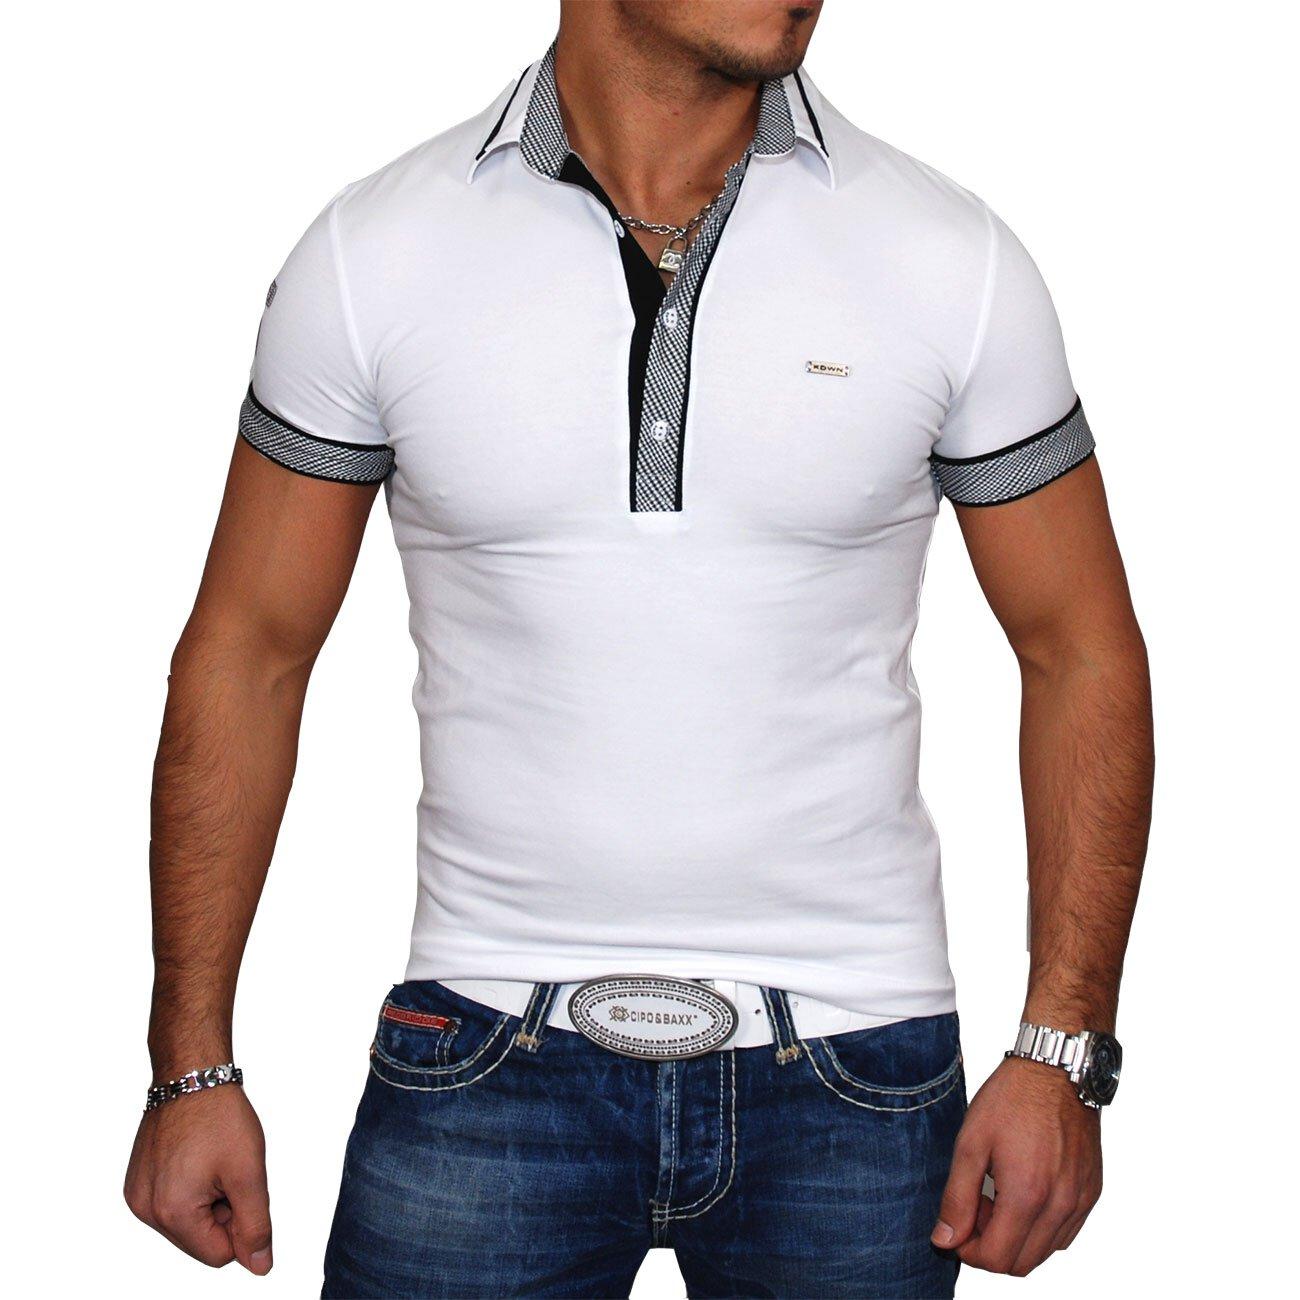 kickdown t shirt herren slim fit poloshirts g nstig. Black Bedroom Furniture Sets. Home Design Ideas